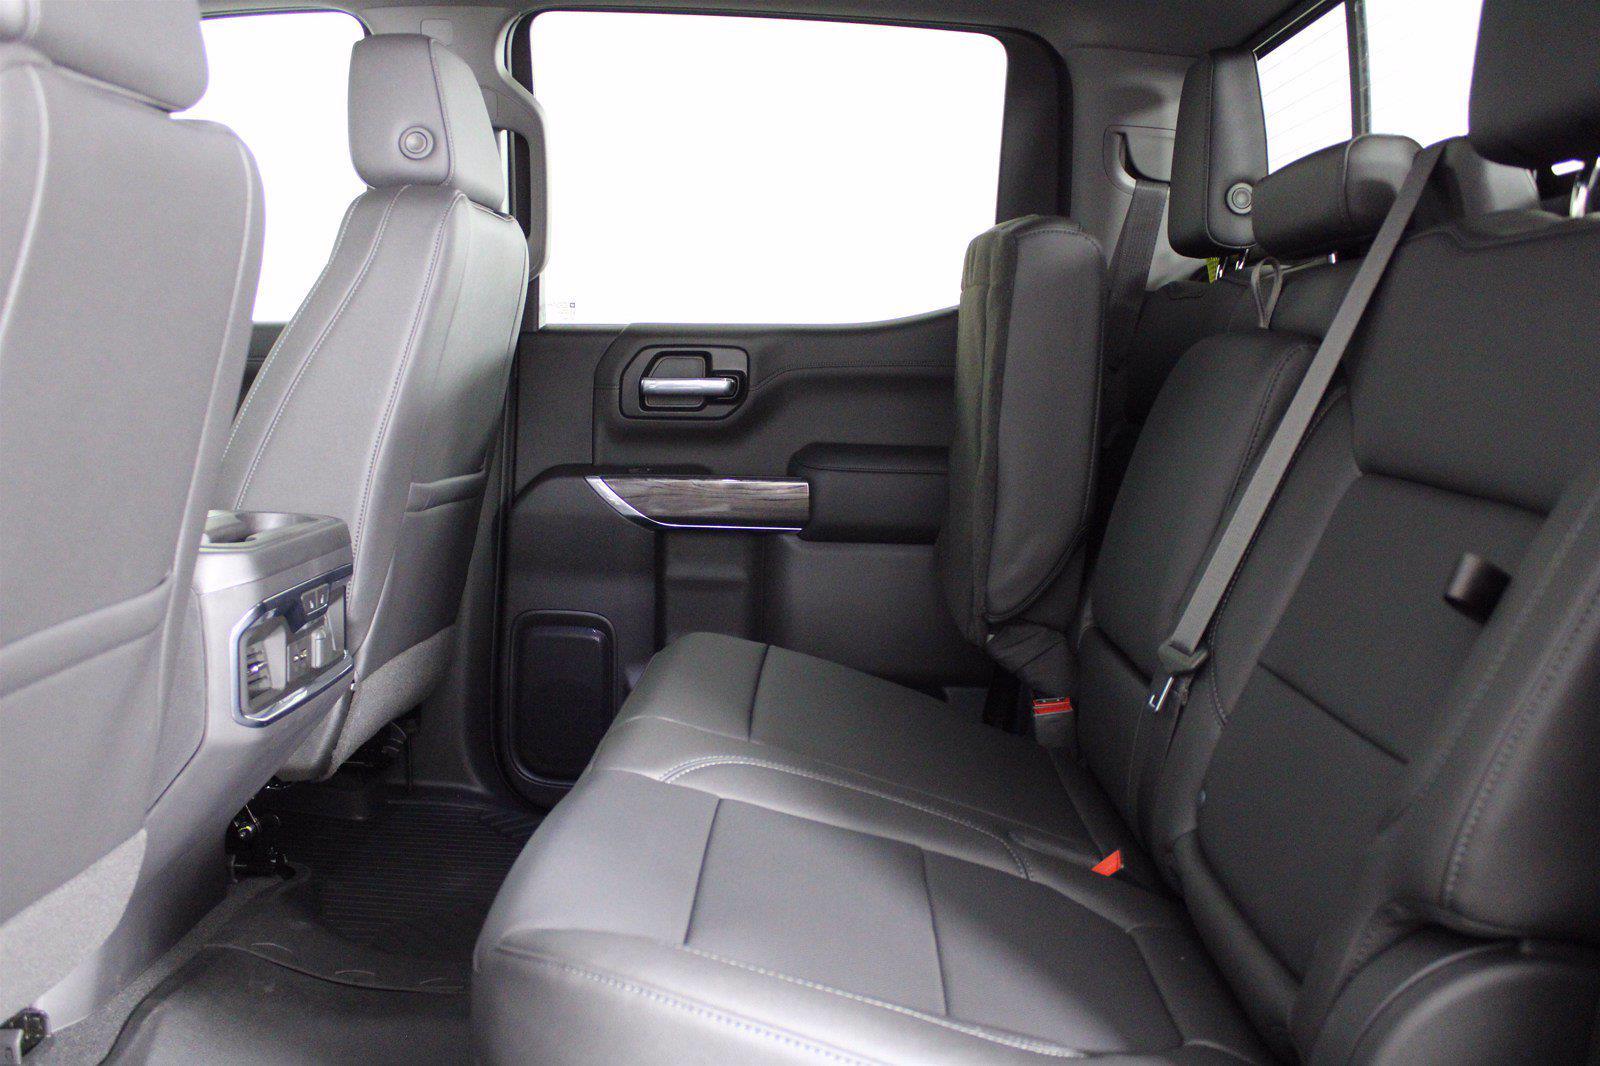 2021 Chevrolet Silverado 1500 Crew Cab 4x4, Pickup #D110863 - photo 17